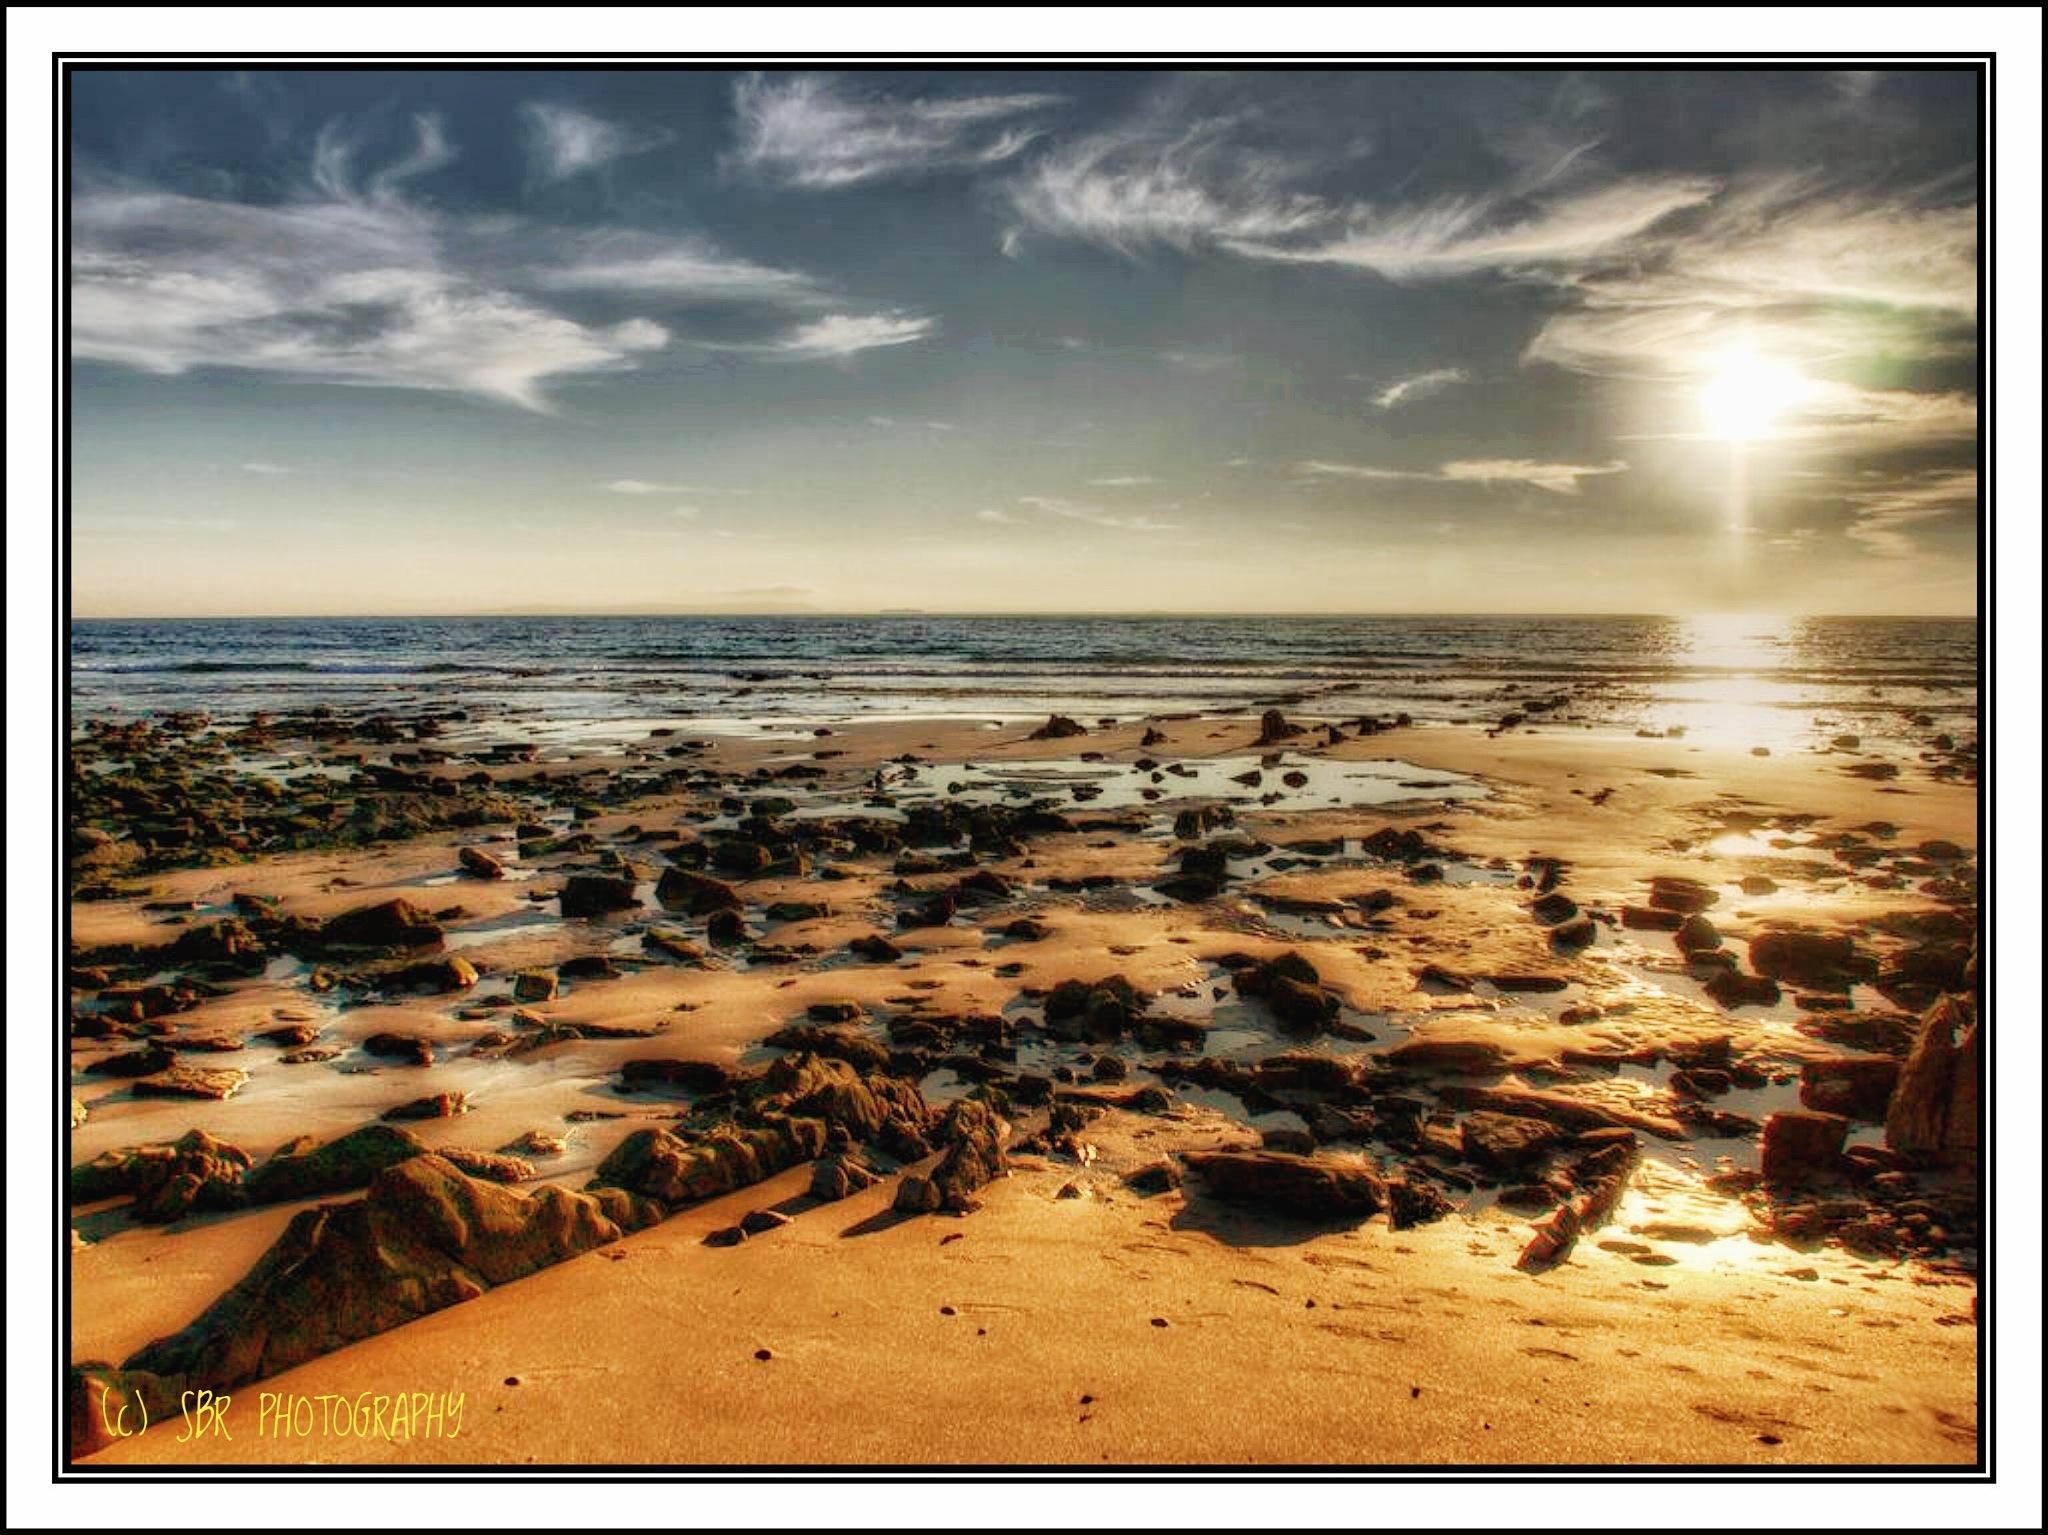 Beach 5 by SteveR